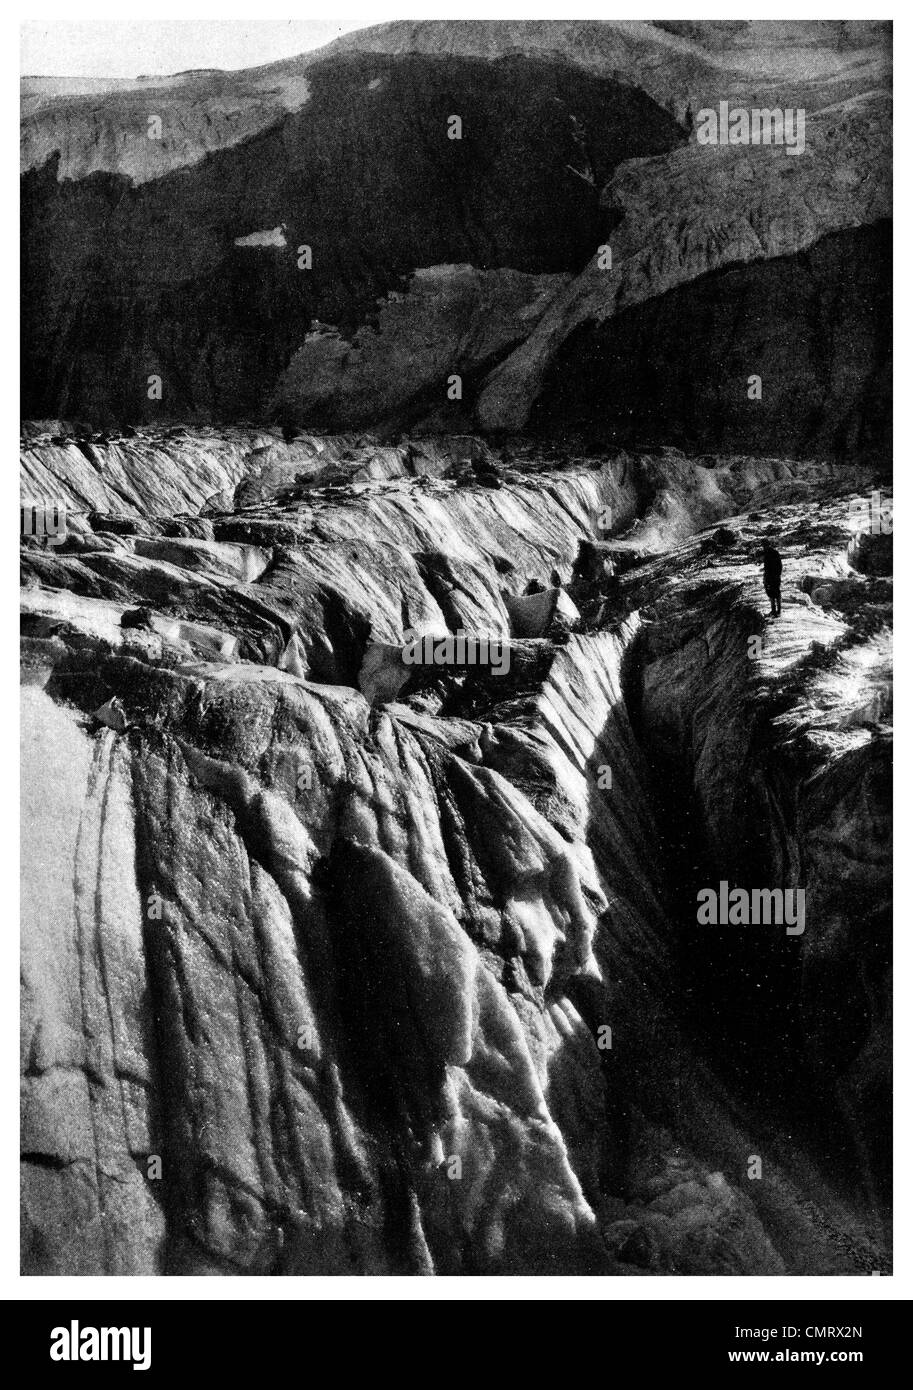 1919 Piedmont Glacier above Lake Maye crevasse - Stock Image